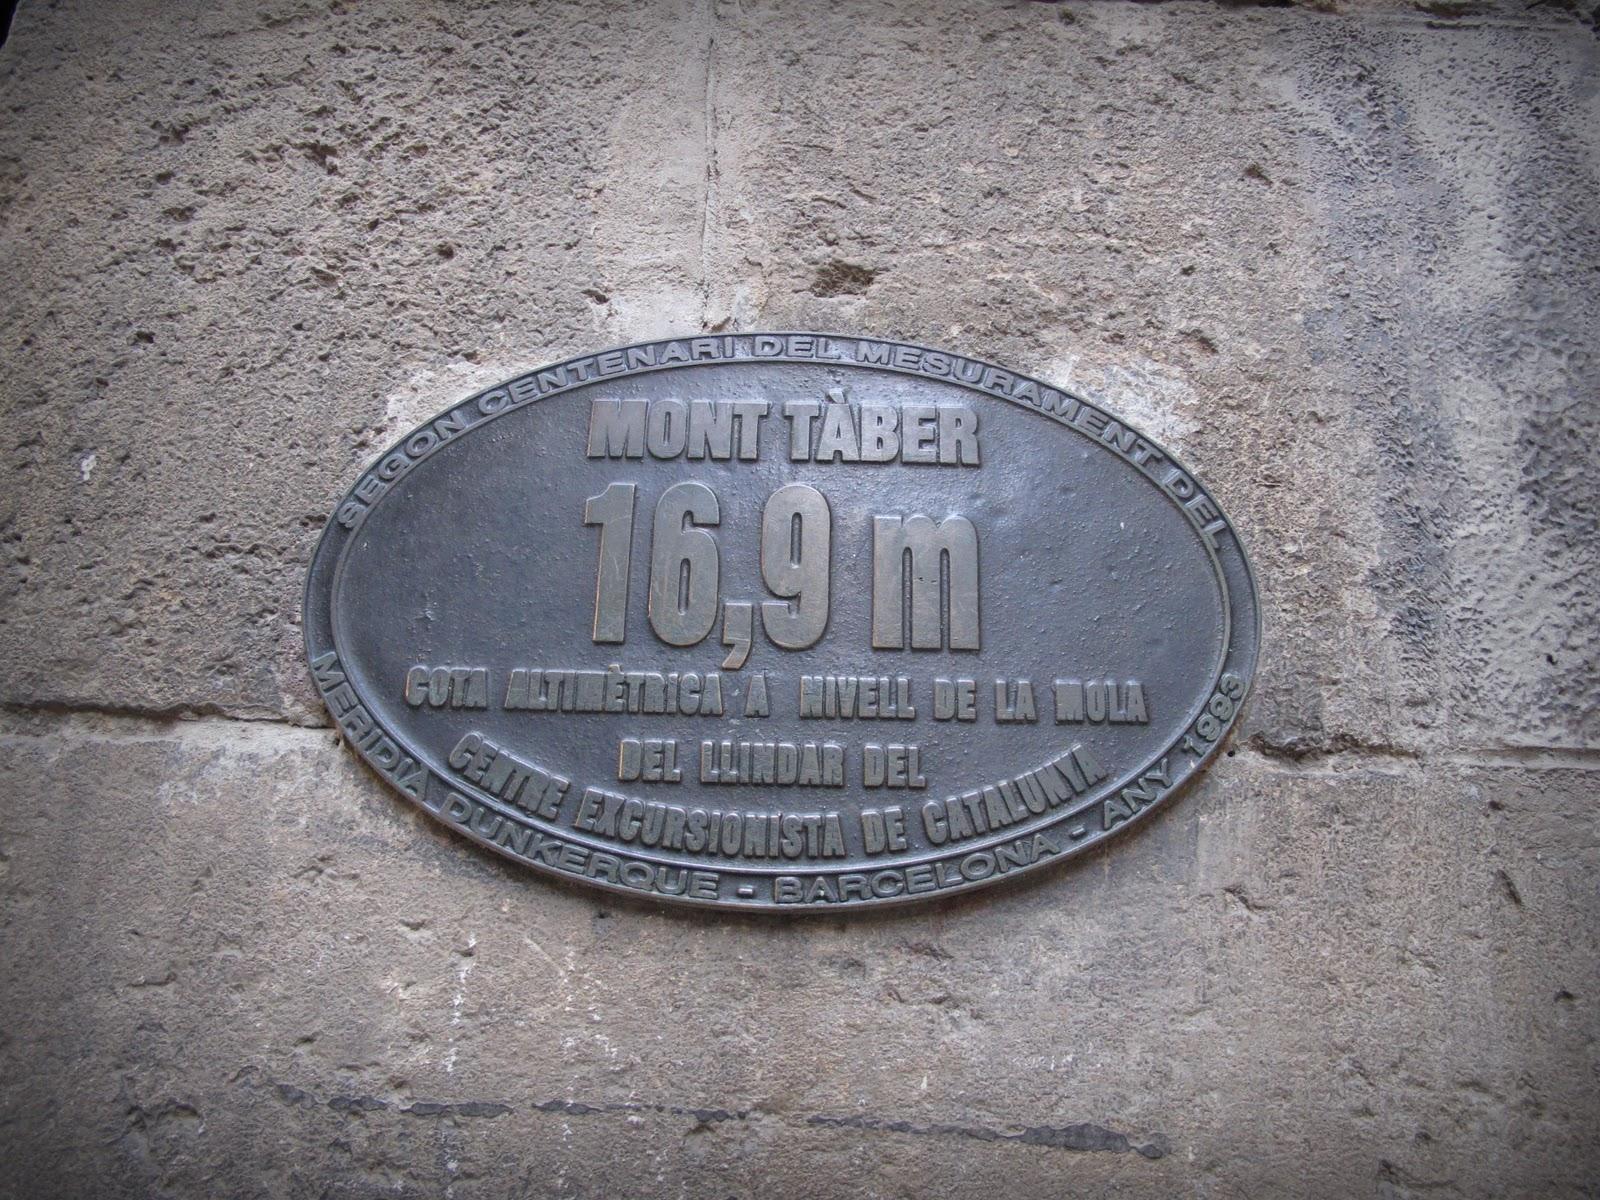 Milerenda paseos curiosos por barcelona 3 parte - Piedra artificial barcelona ...